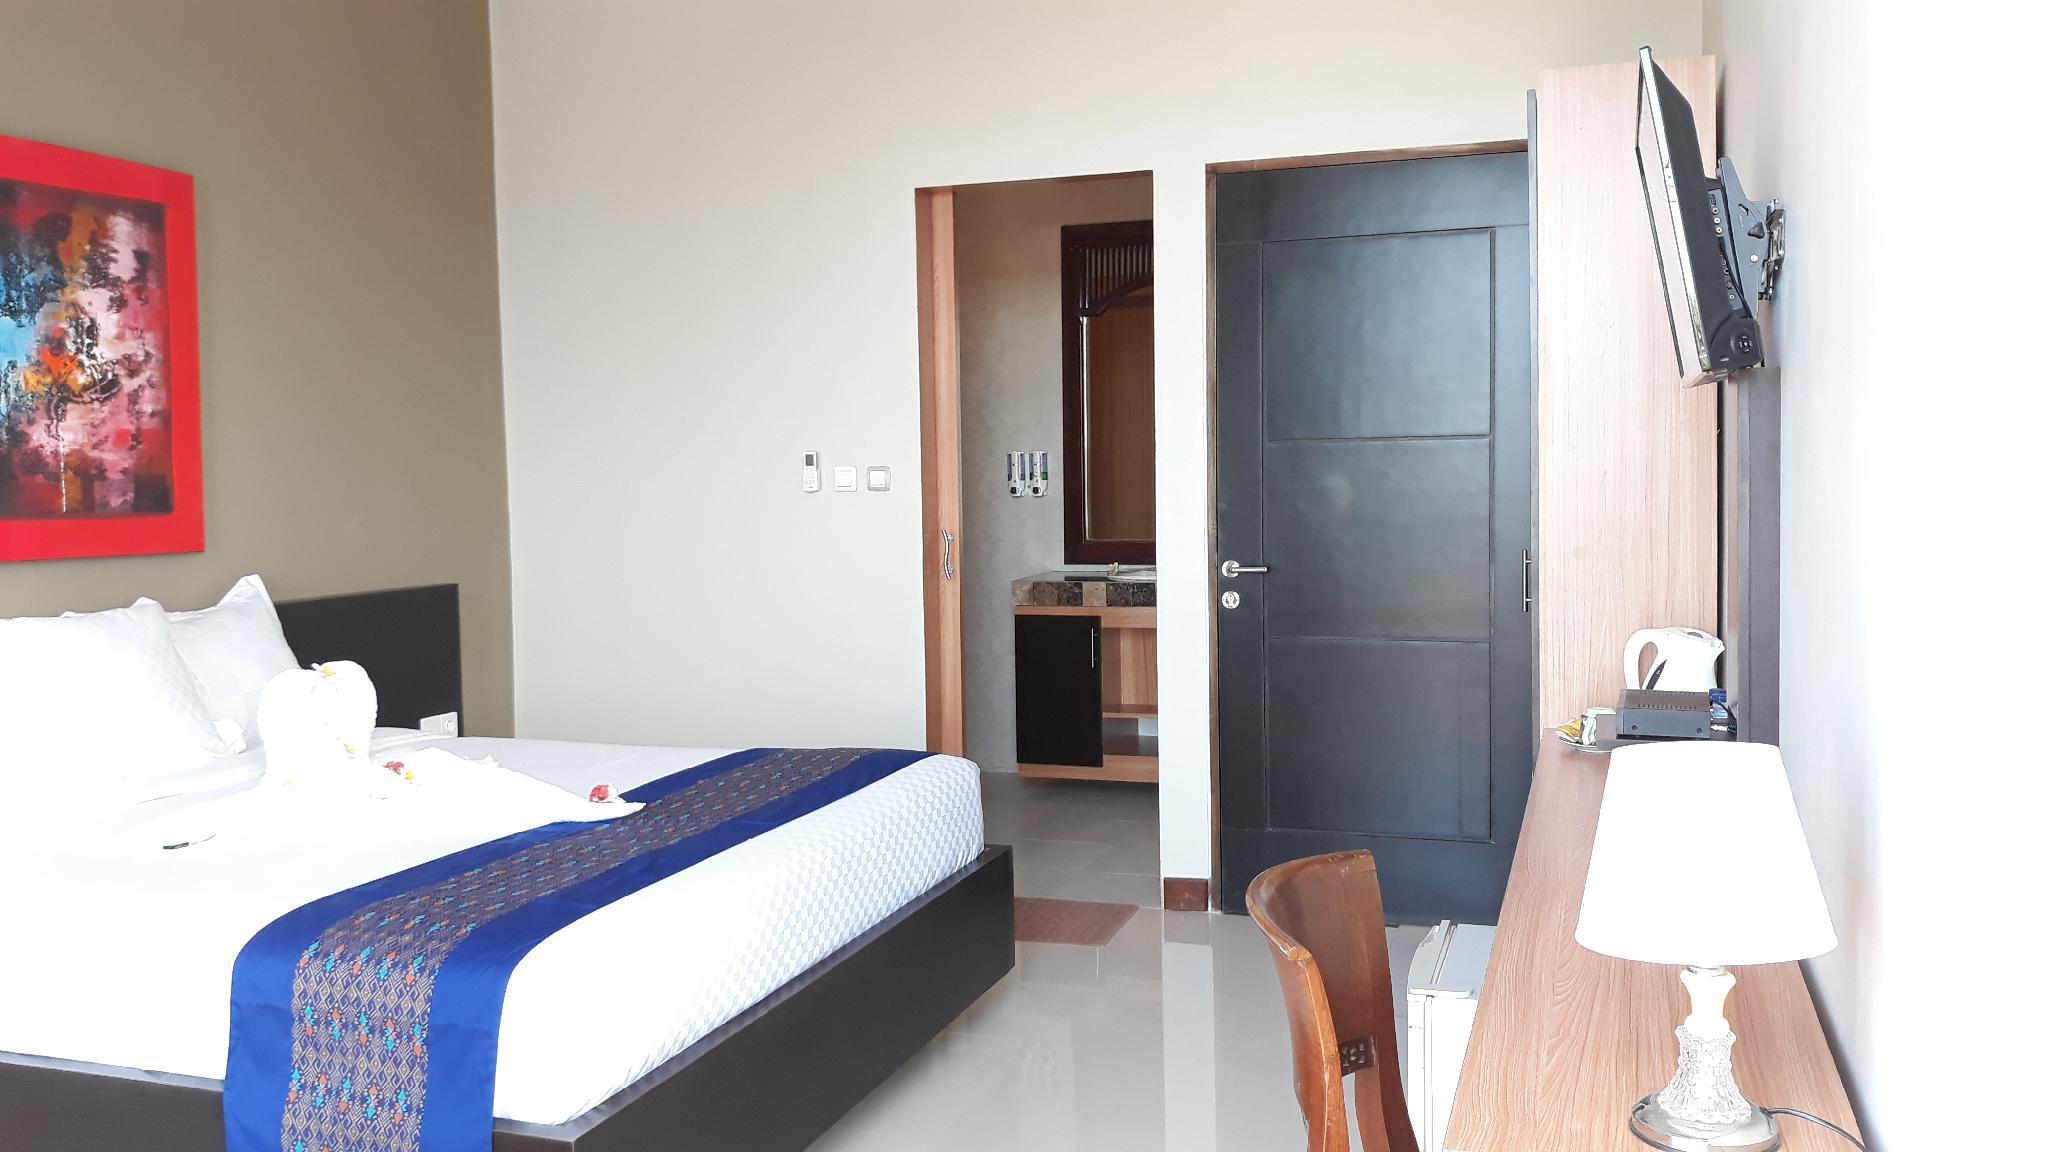 Asiana Lovina Hotel & Karaoke, Buleleng